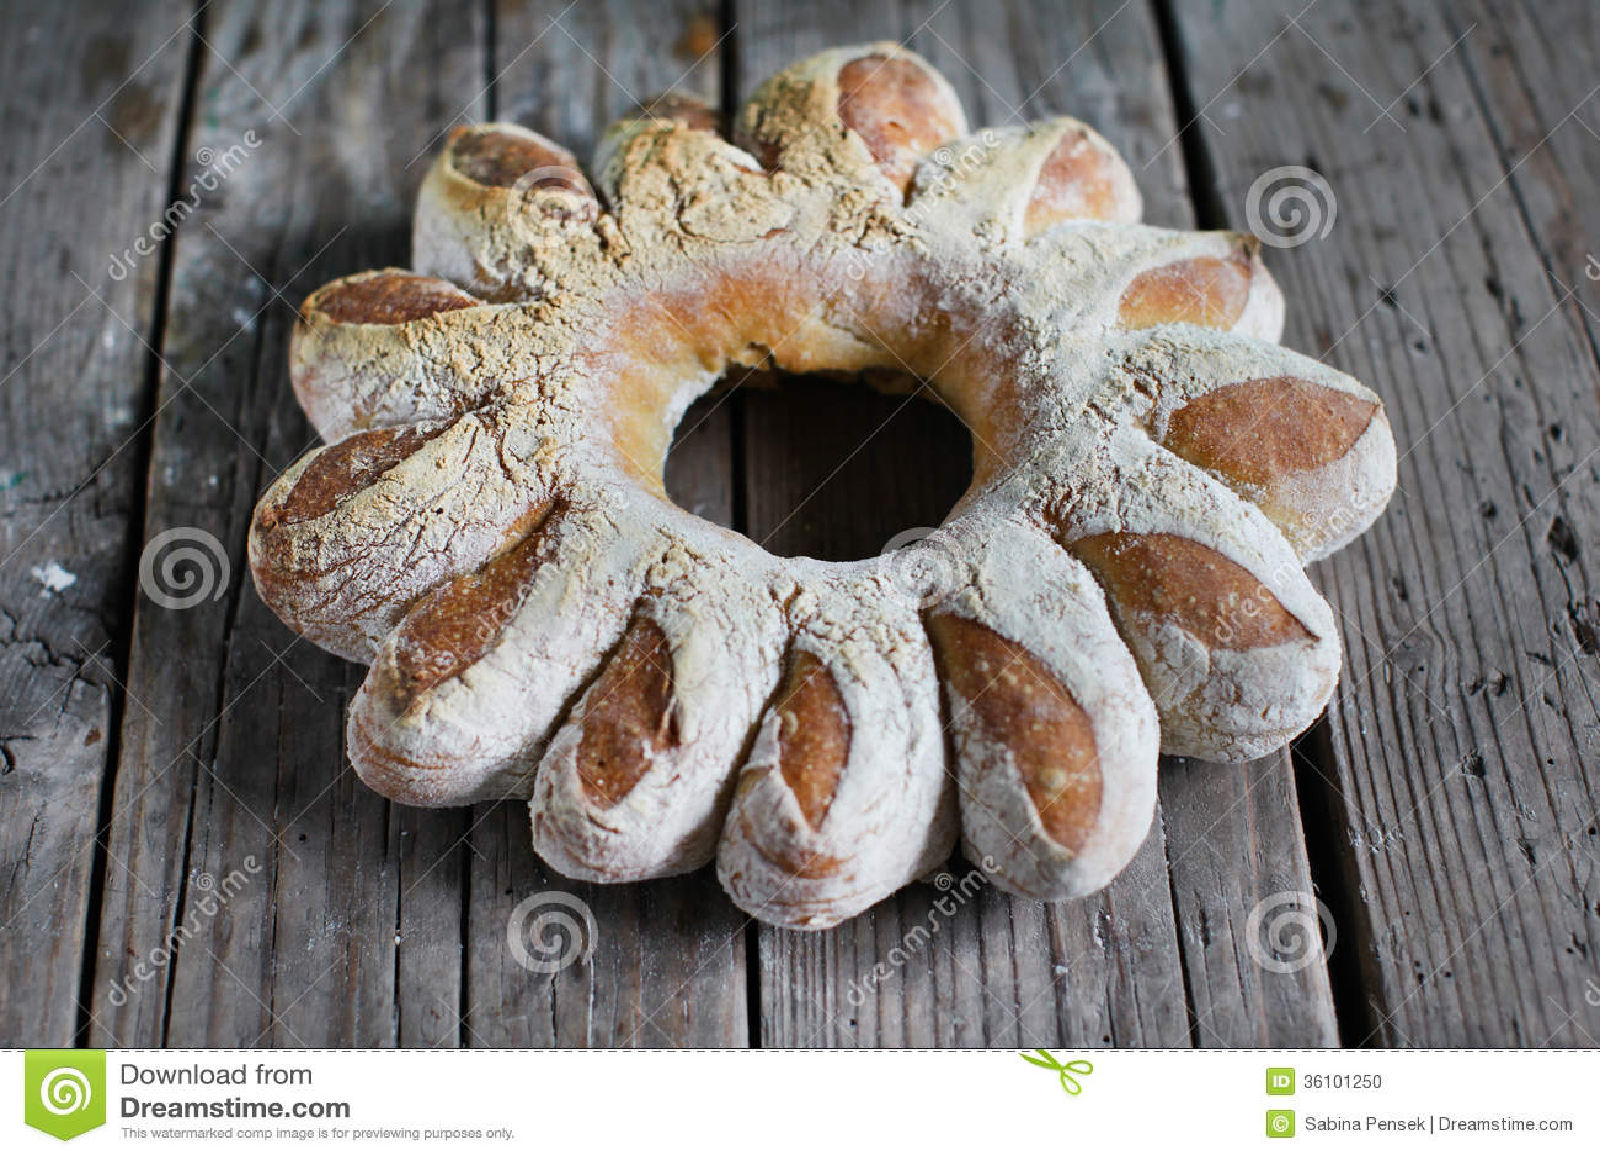 Broodkroon, artisanaal gevormd roggebrood